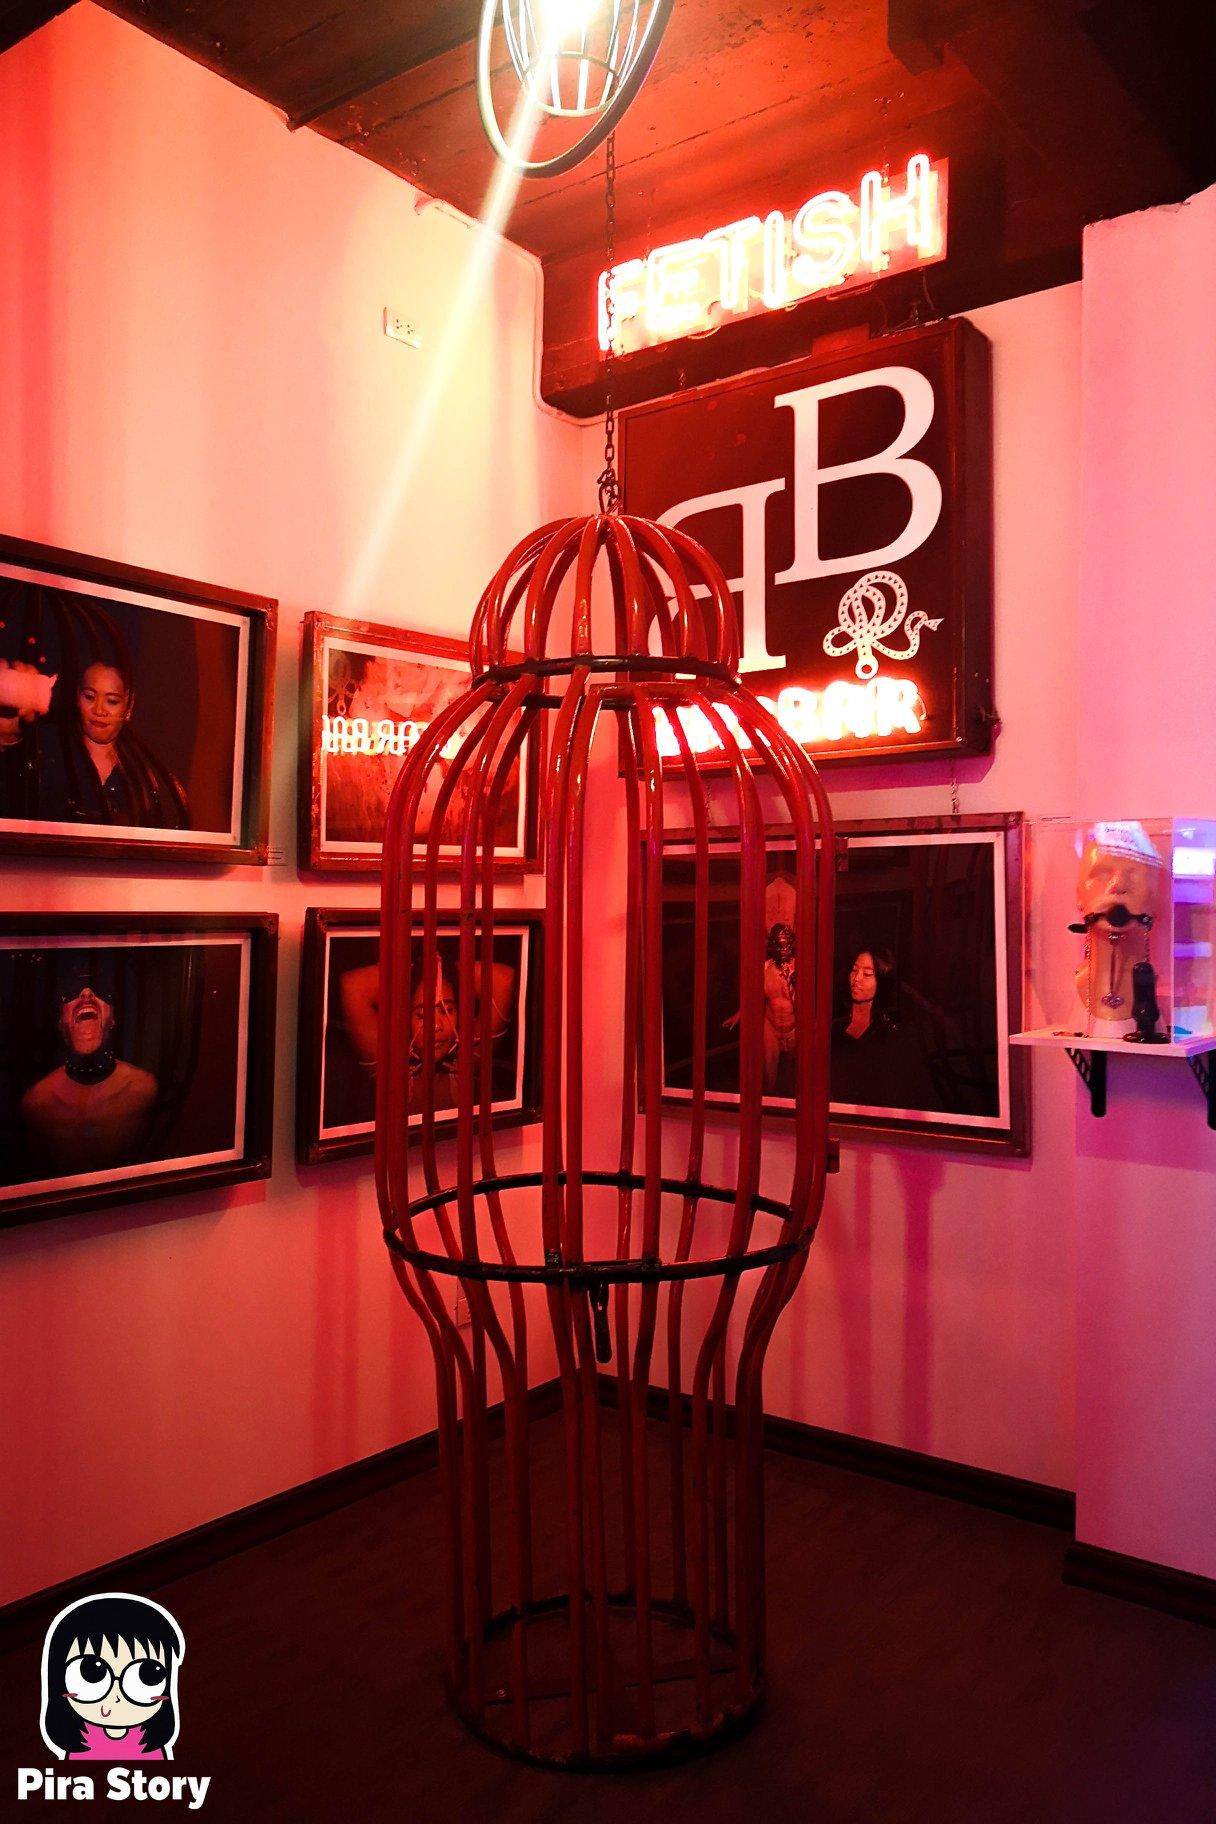 Fetish BDSM Fifty shades of grey ซาดิสม์ ความรุนแรง พิพิธภัณฑ์พัฒน์พงศ์ Patpong museum พัฒน์พงศ์มิวเซียม sex worker ซ่อง ประวัติศาสตร์ โคมเขียว พัฒน์พงศ์มิวเซียม pira story pirastory เที่ยวเนิร์ดๆ บาร์ลับ คาเฟ่ลับ สีลม ศาลาแดง